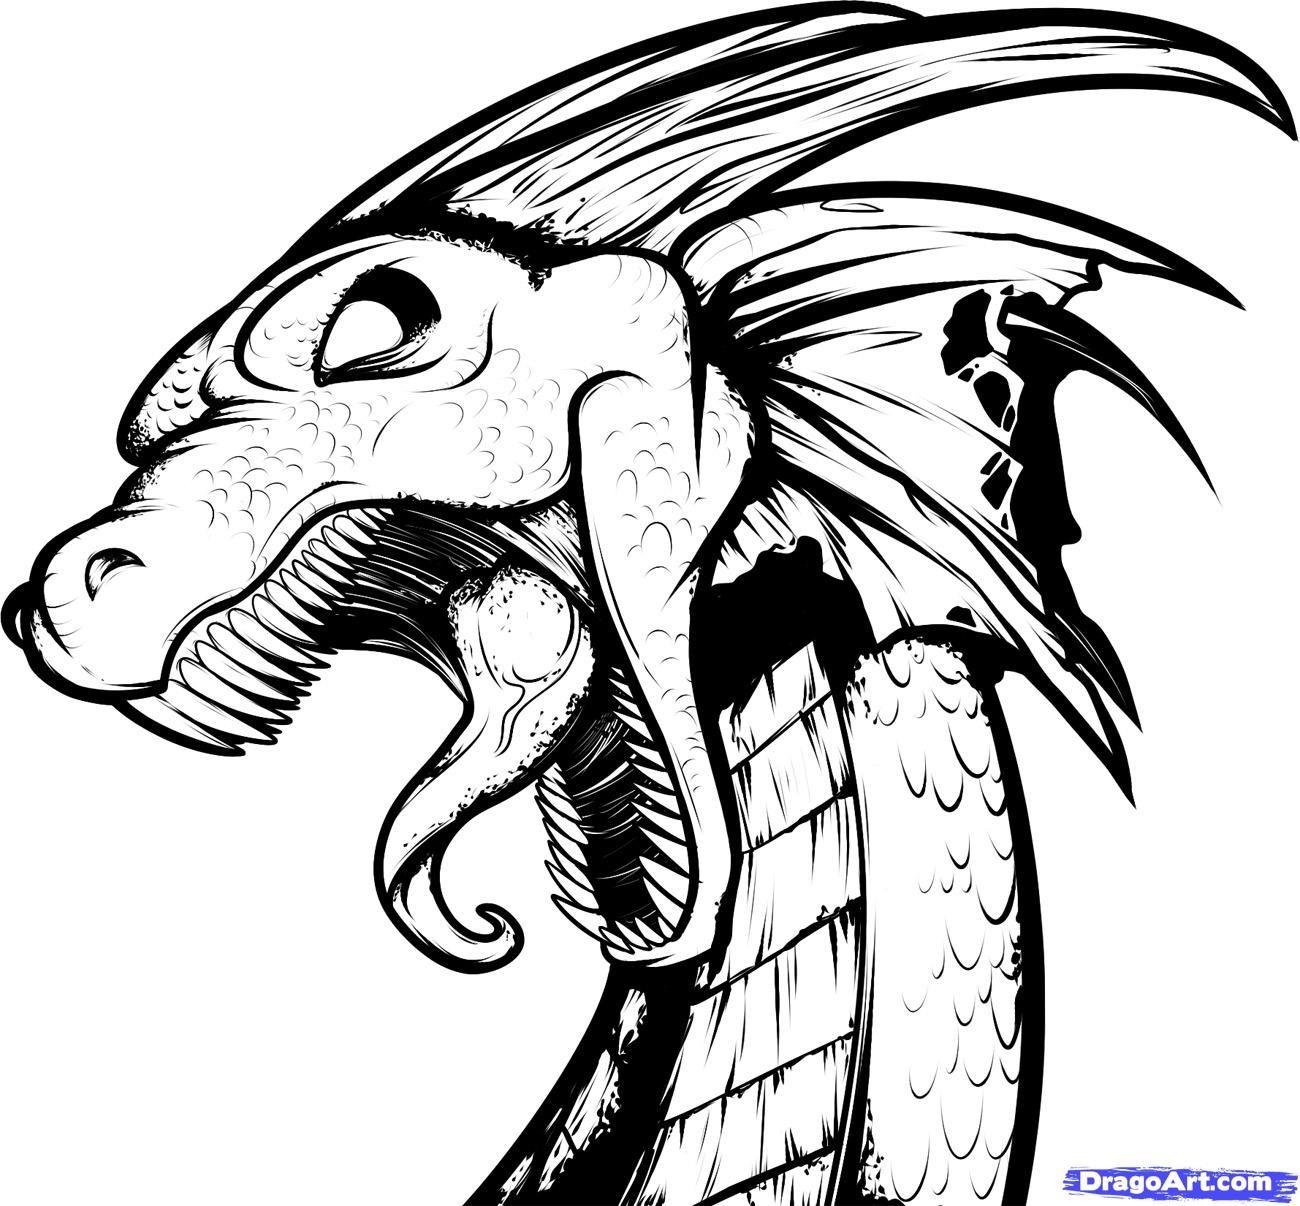 Dragon Tattoos For Women - Google Search